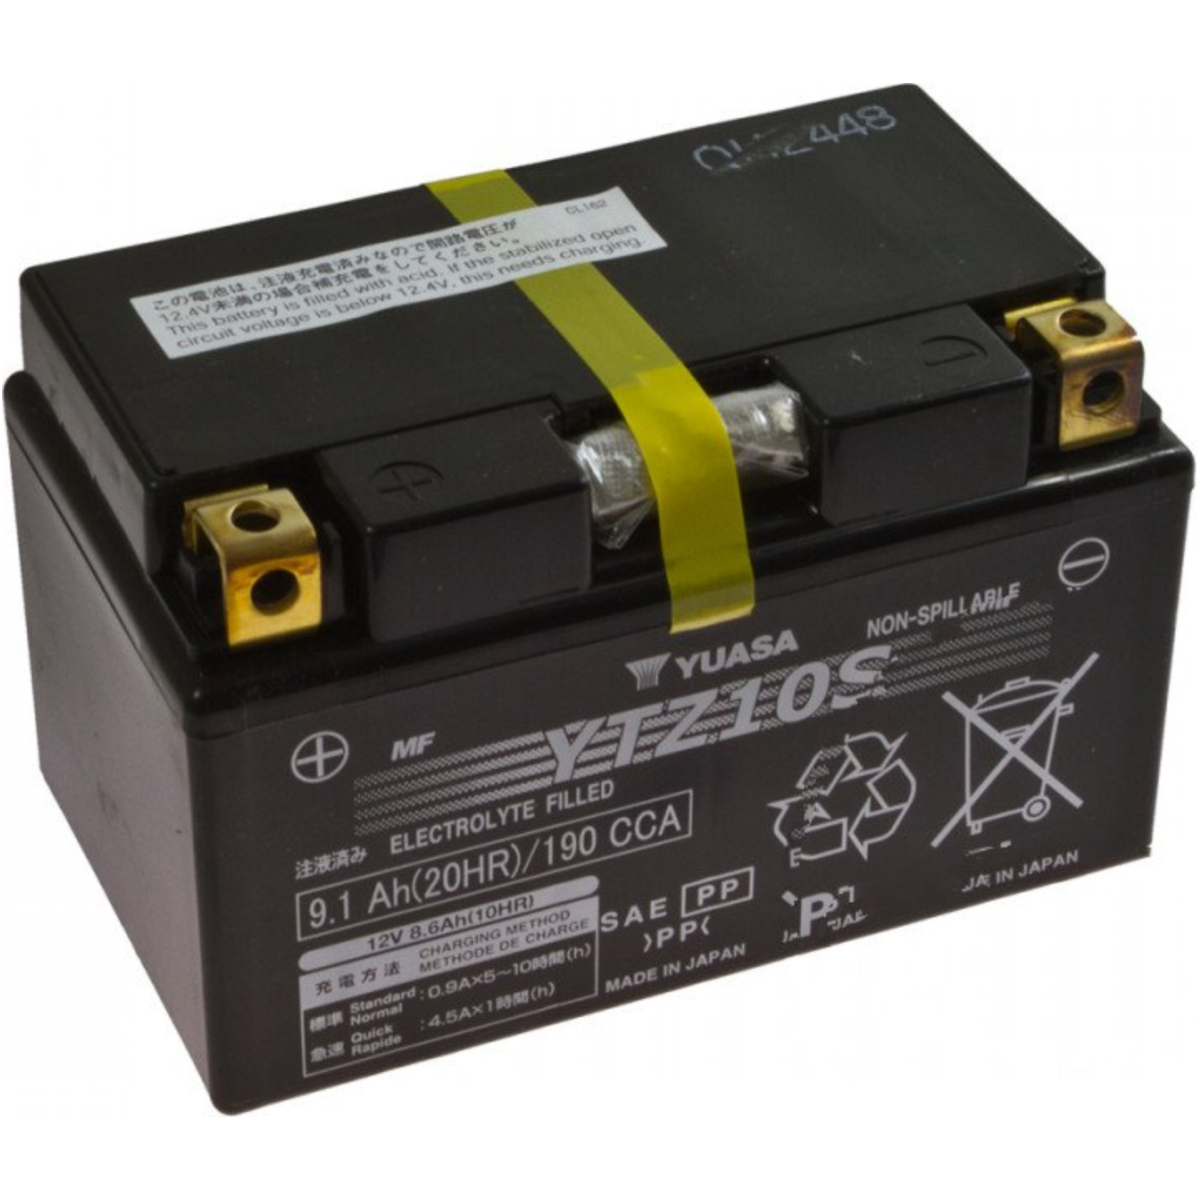 Motorcycle Battery Ytz10s Yuasa Yamaha Mt 09 Tracer Abs 78263 Monitor Fr 850 Rn29f 2015 115 Ps 85 Kw